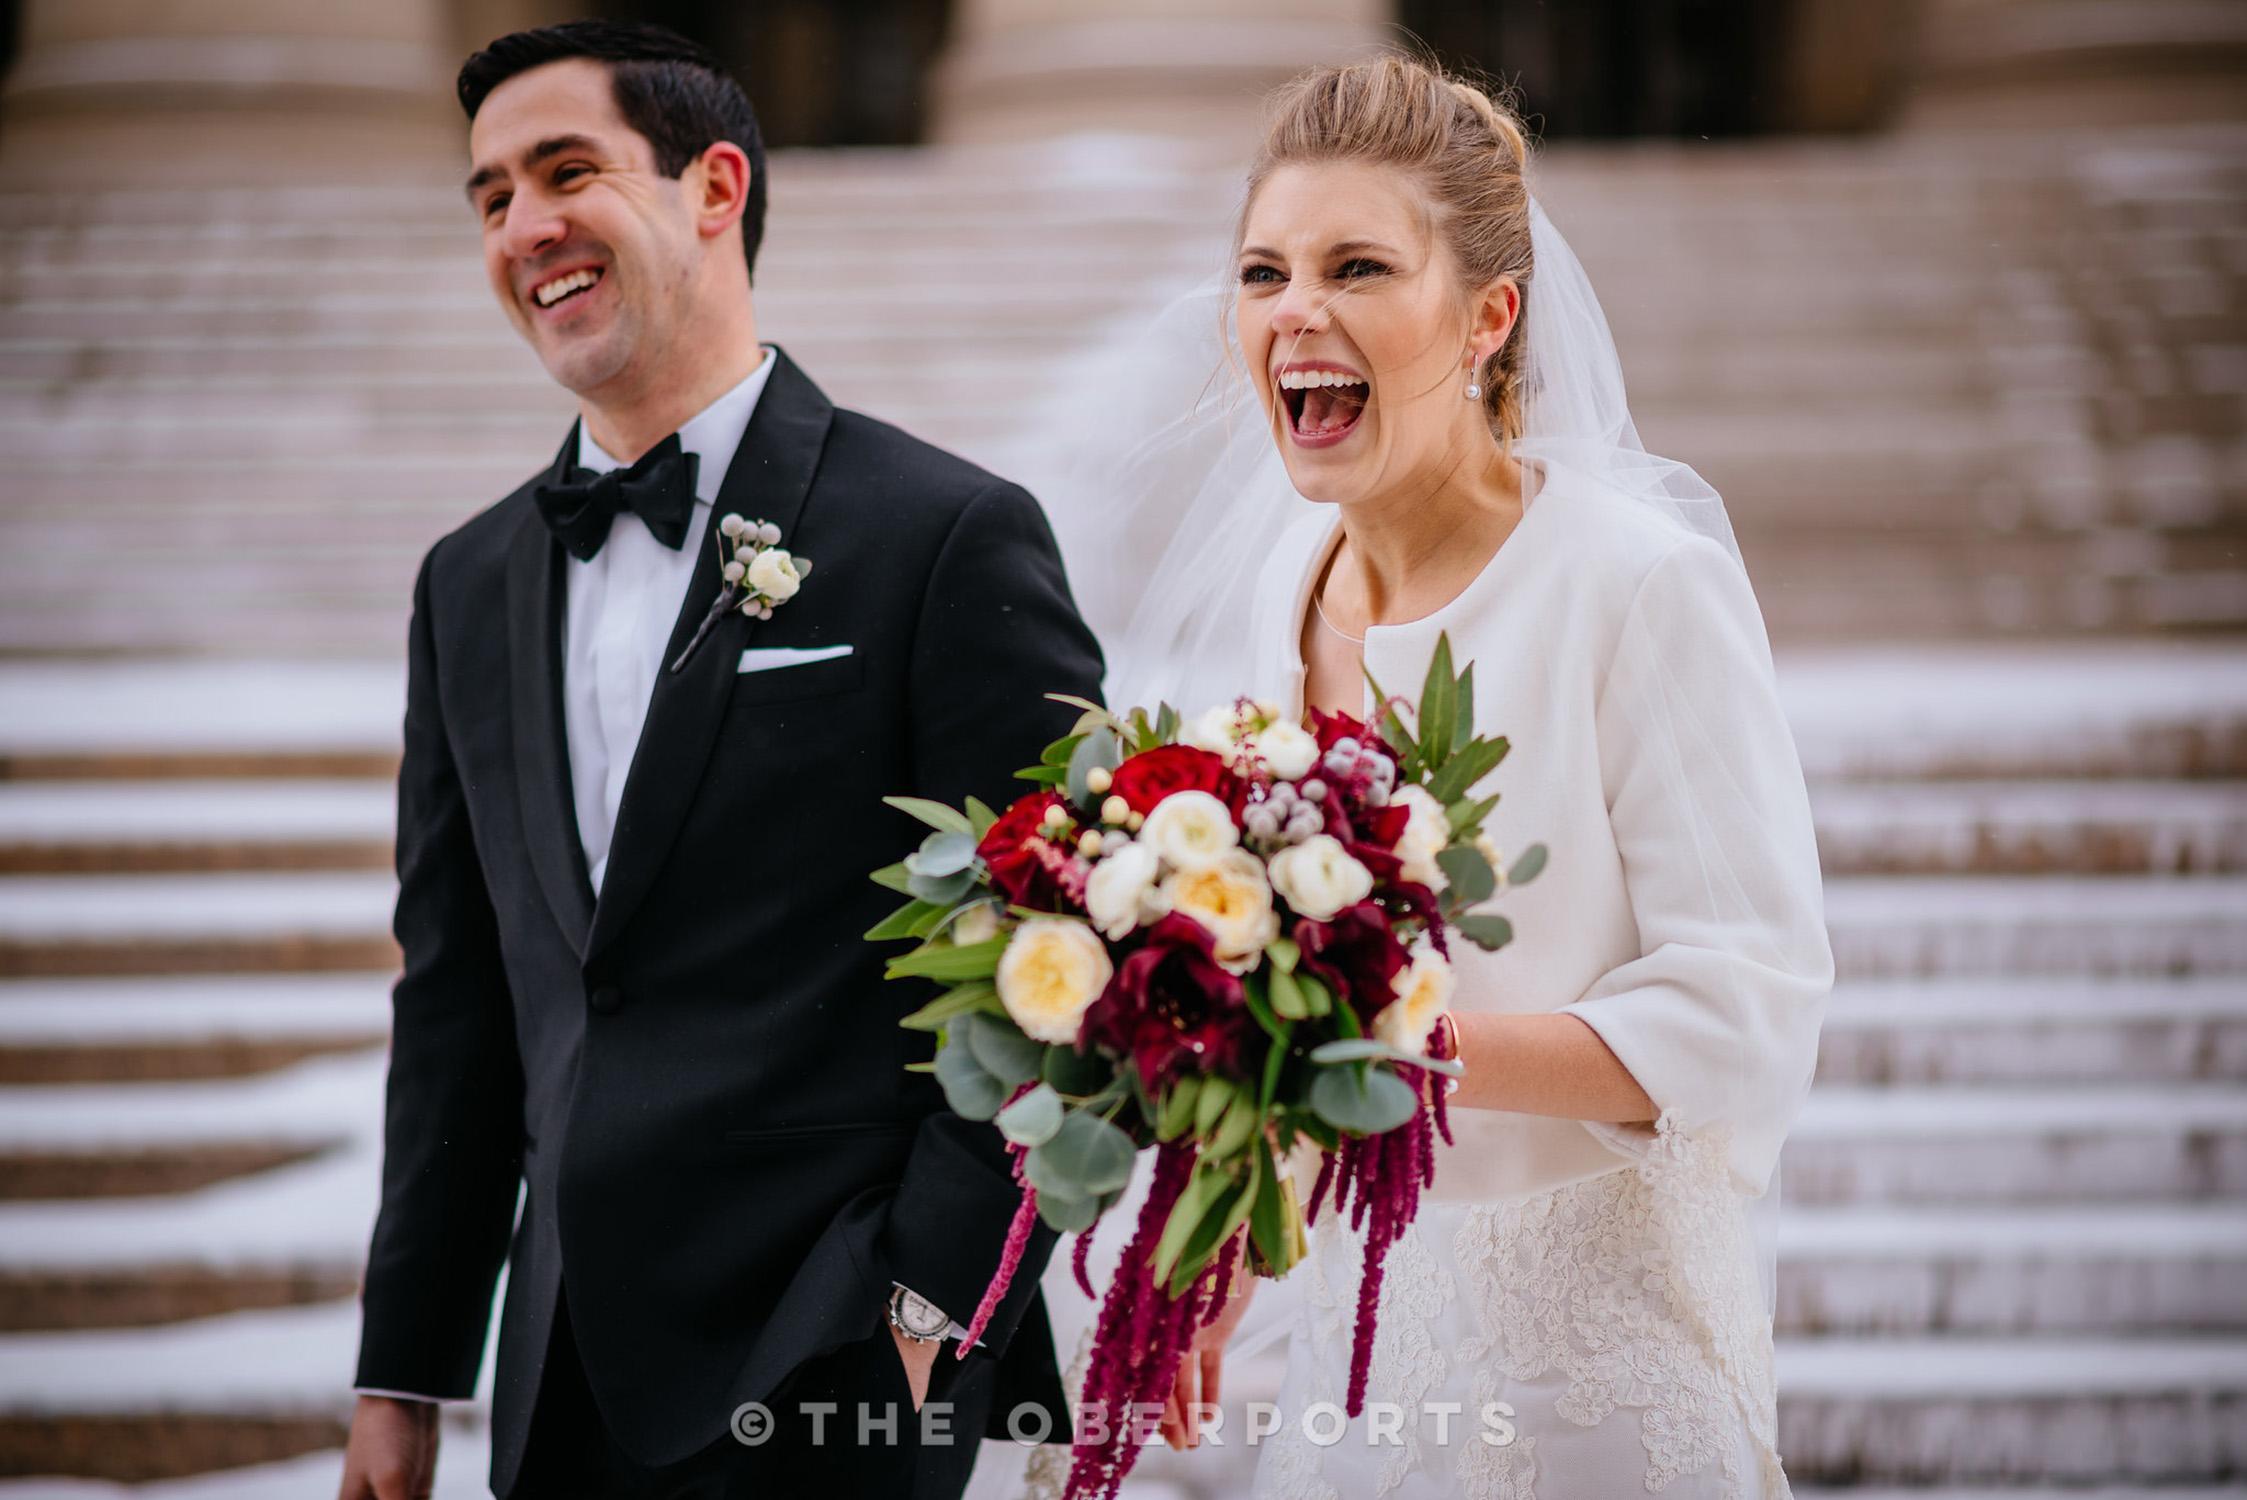 425-joaniechris-wedding.jpg